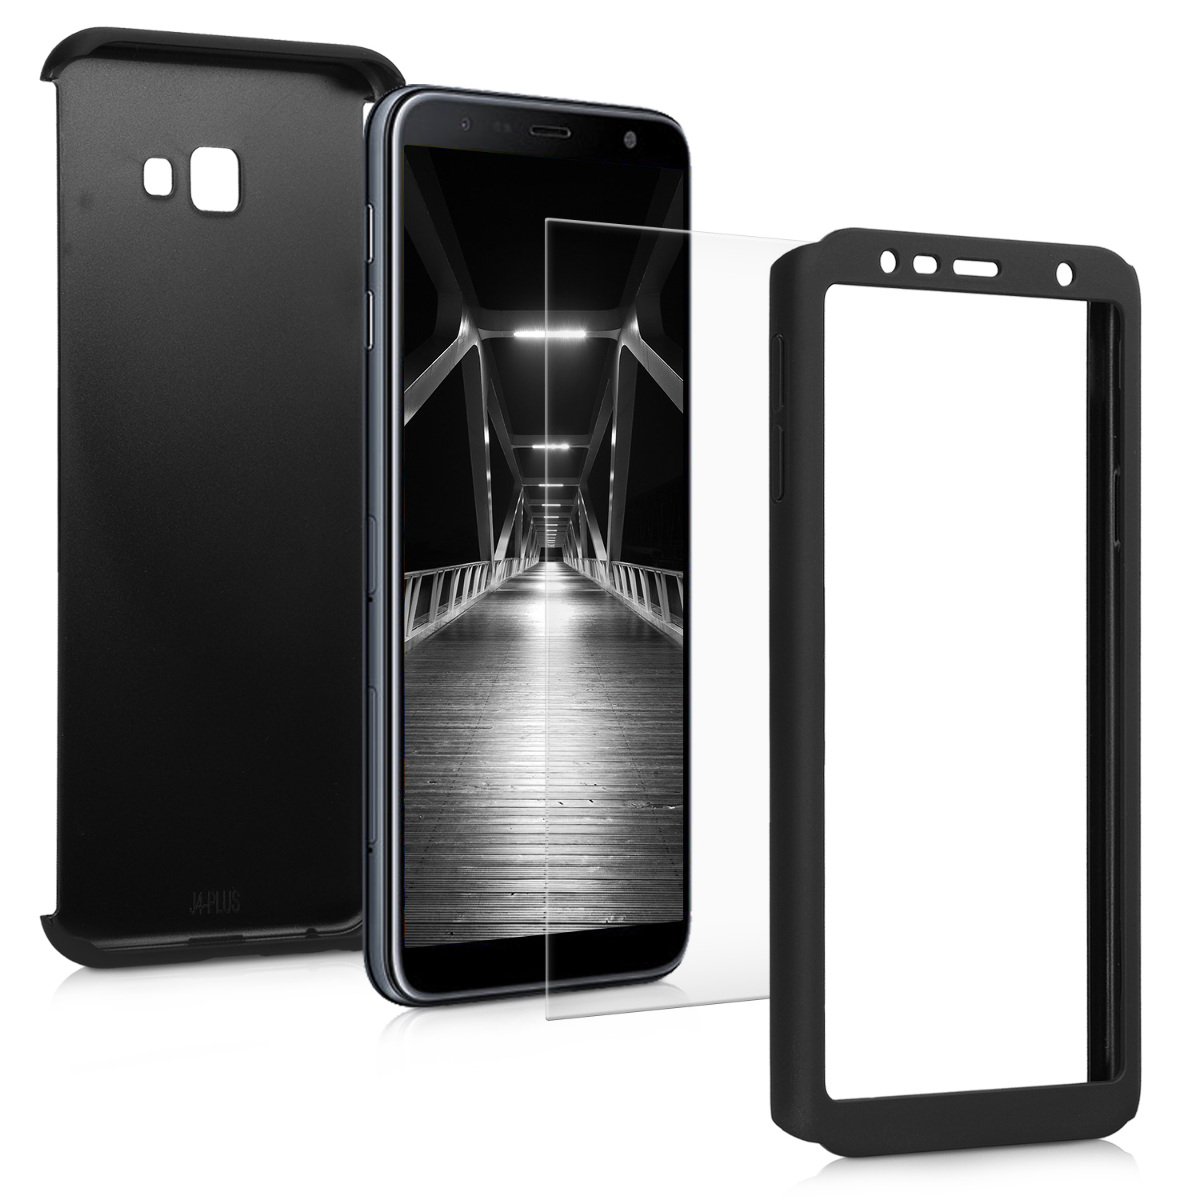 KW Θήκη Full Body with Screen Protector - Samsung Galaxy J4 Plus - Metallic Black (47115.68)